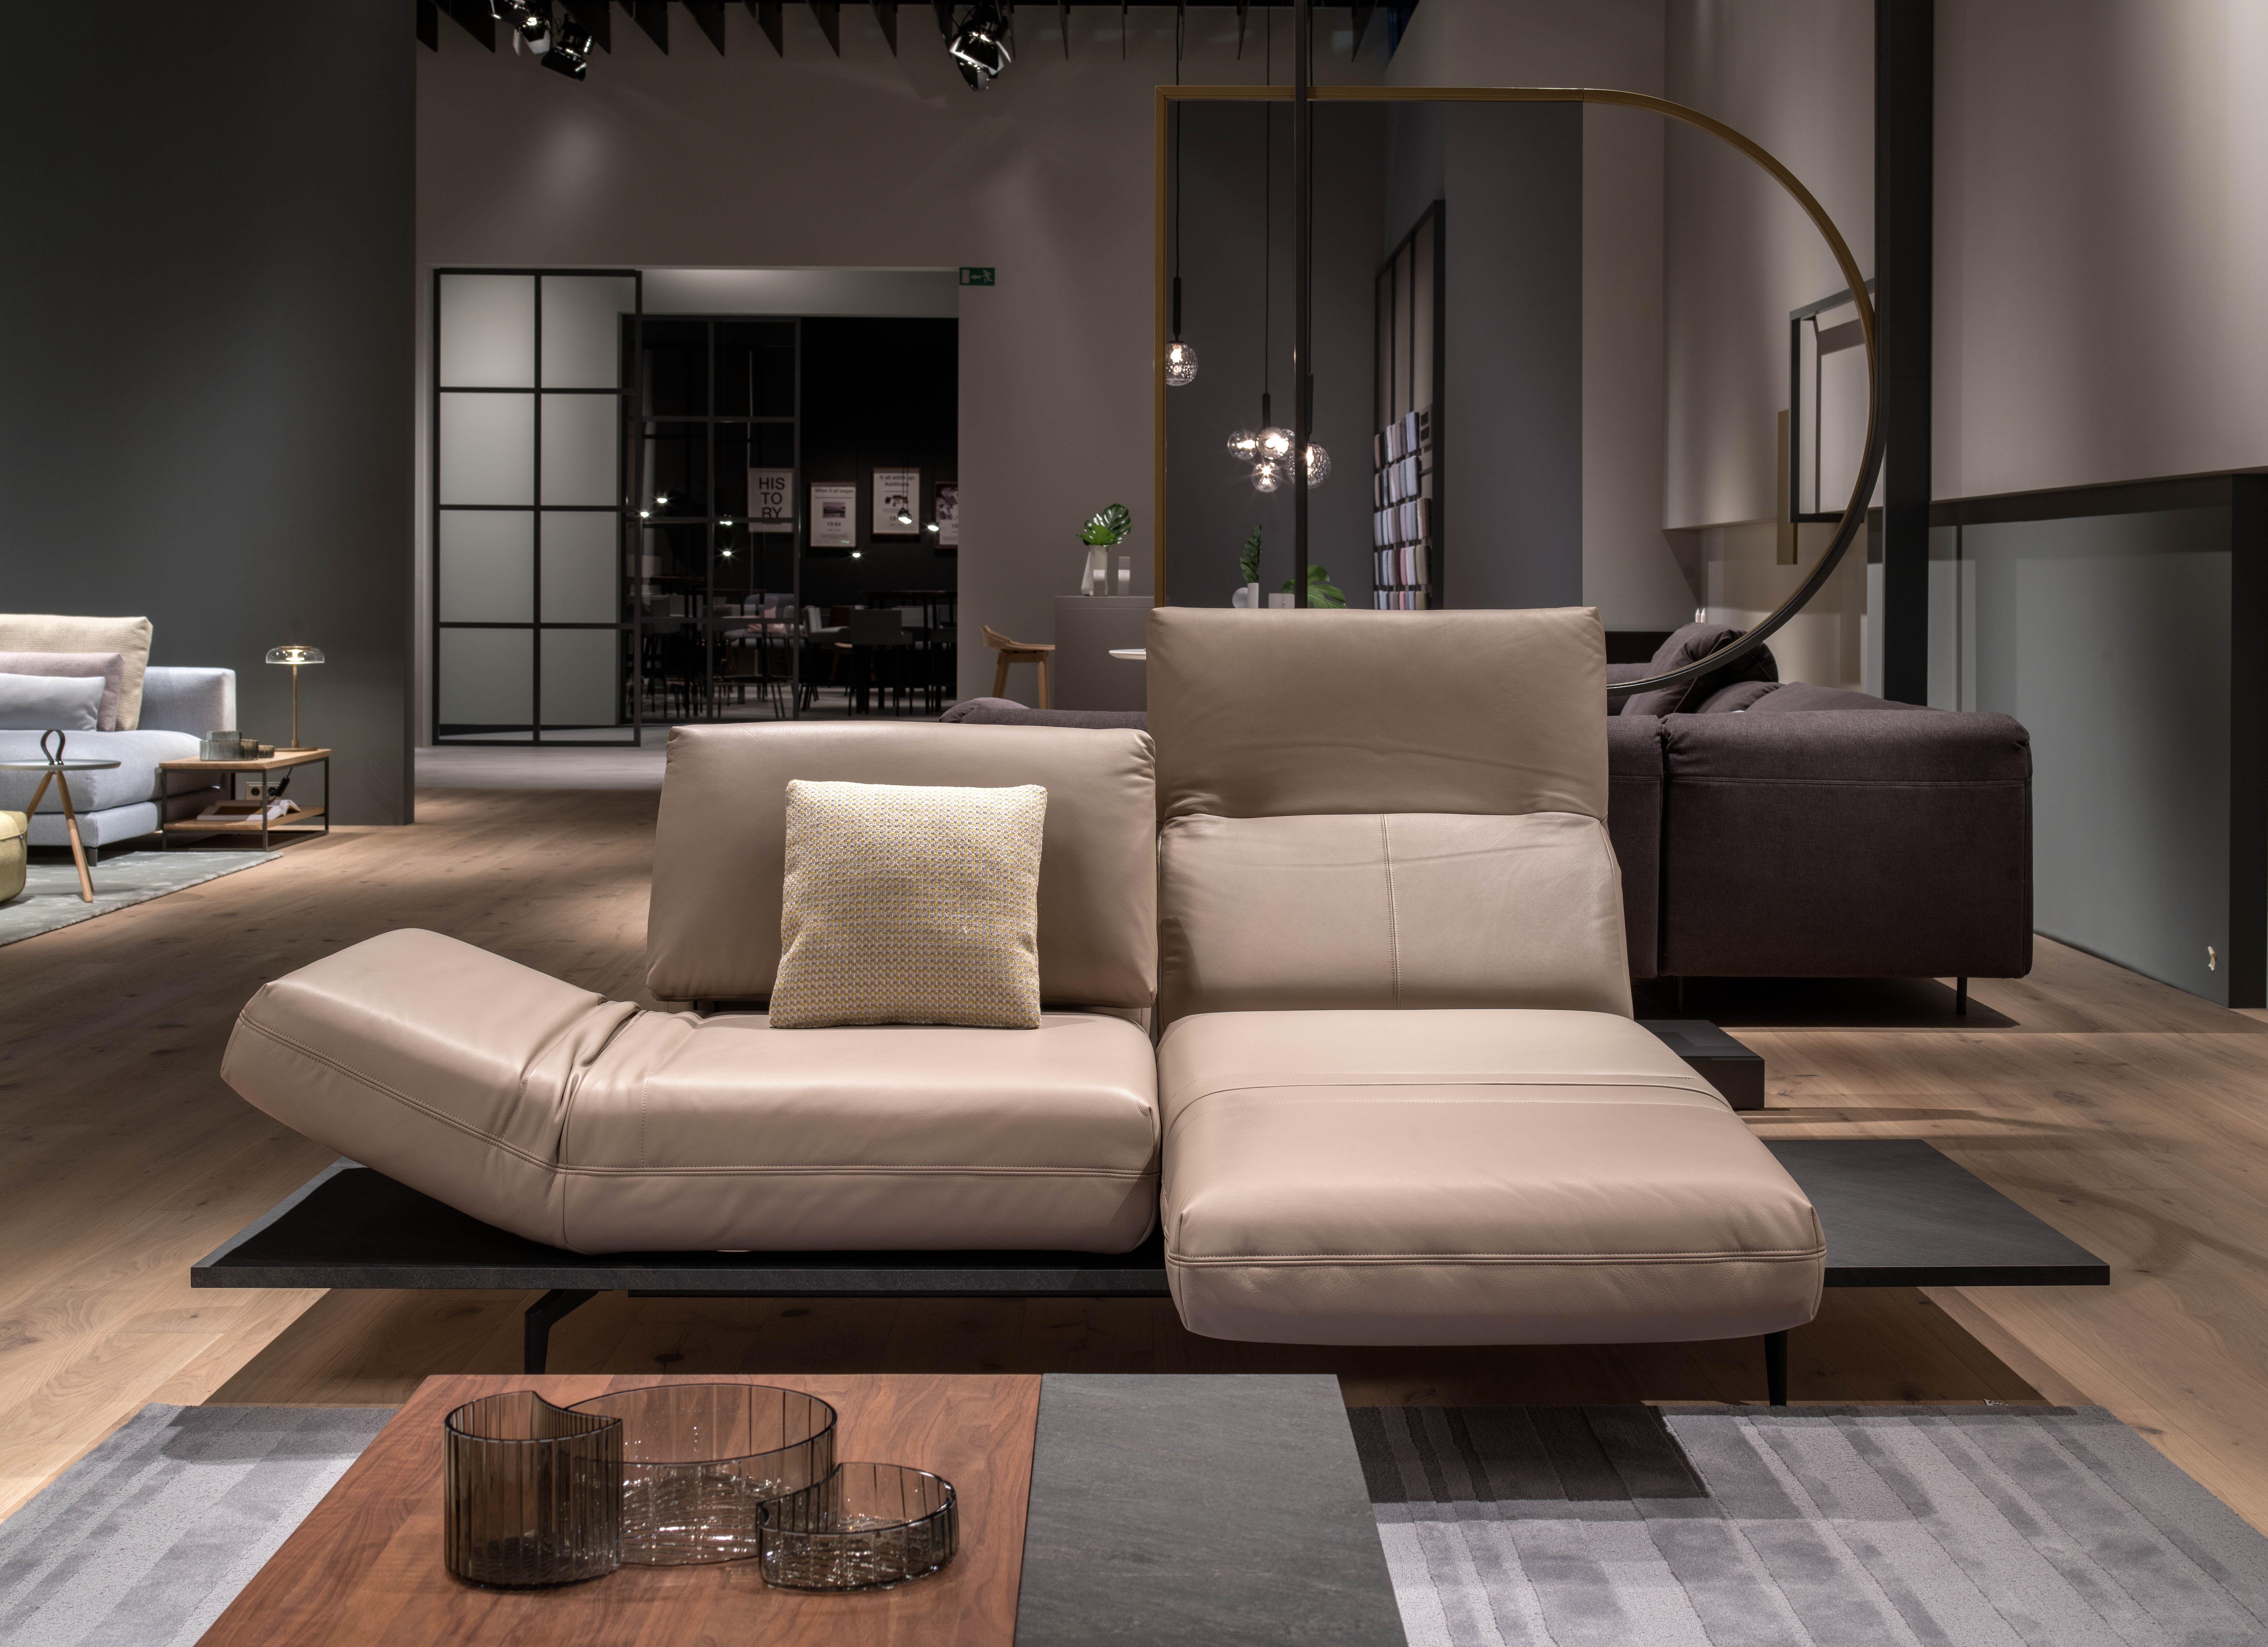 Rolf Benz Bank 629.Rolf Benz Aura Relaxed Presence Flexibility And